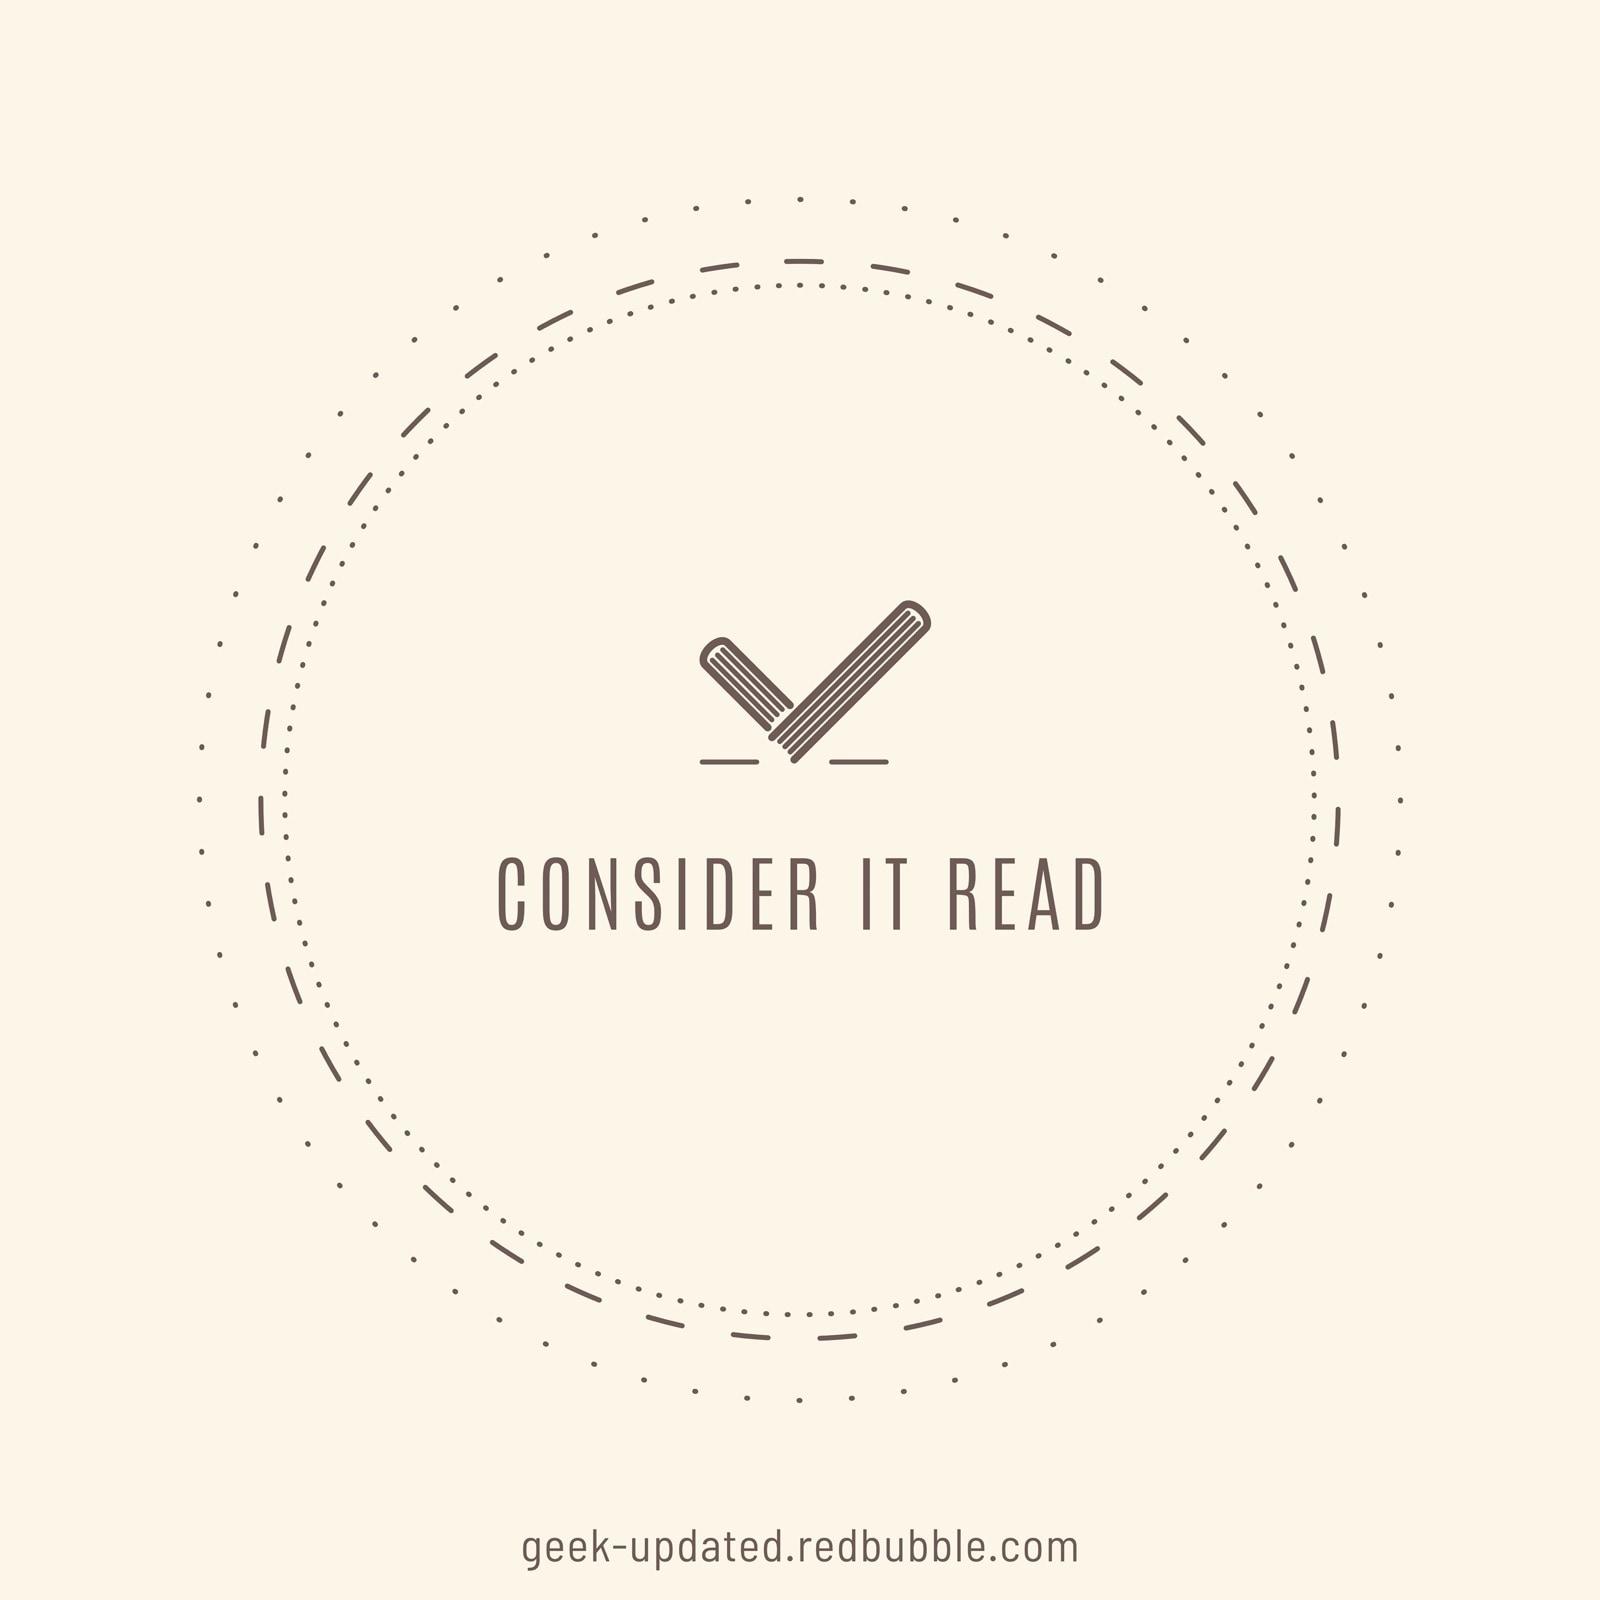 Consider it read - designed by Piotr Kowalczyk